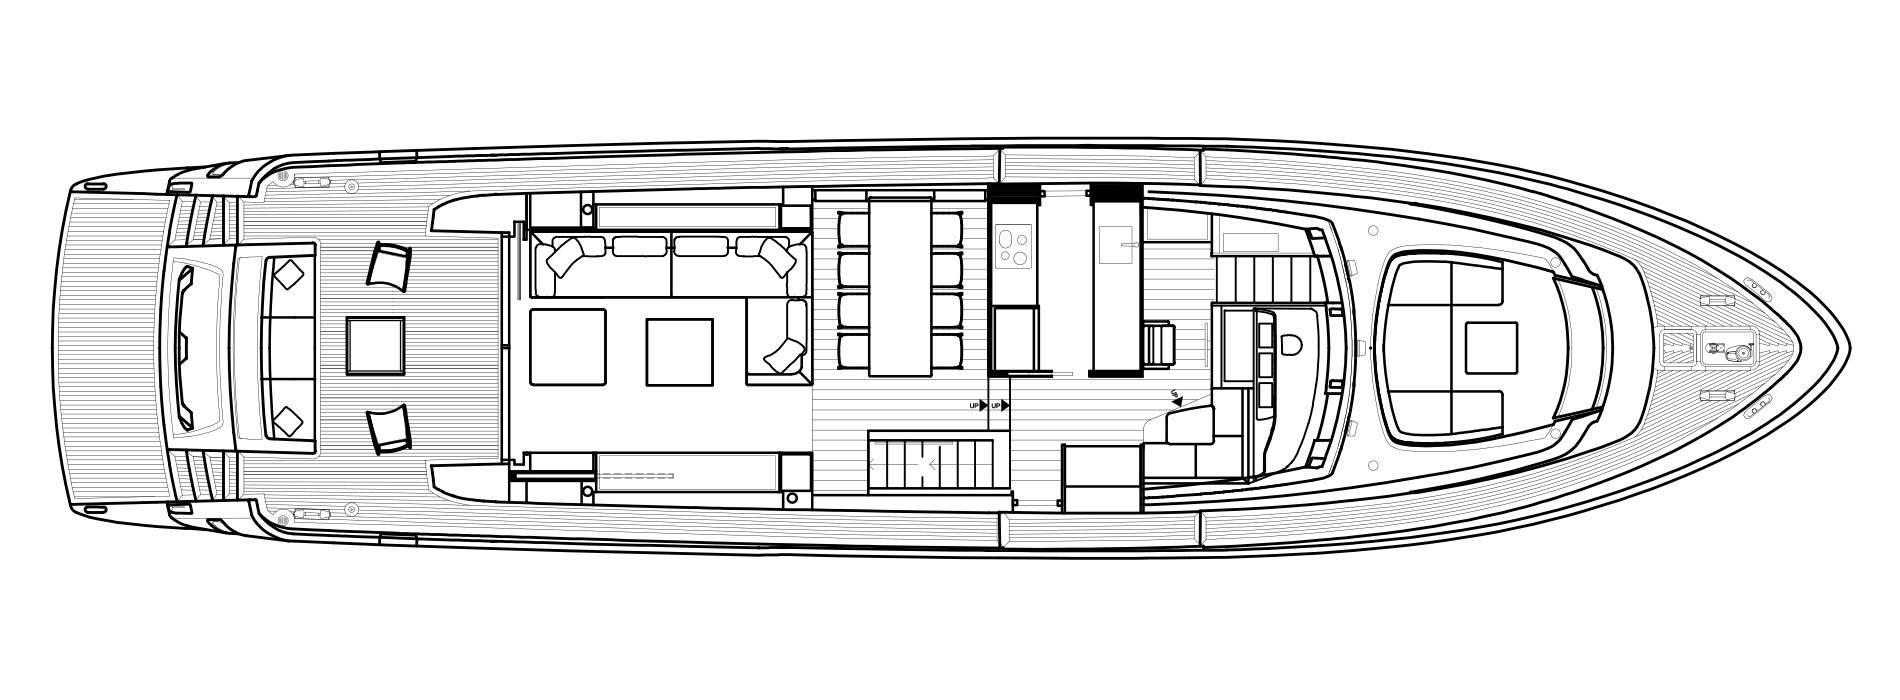 Sanlorenzo Yachts SL78 Главная палуба